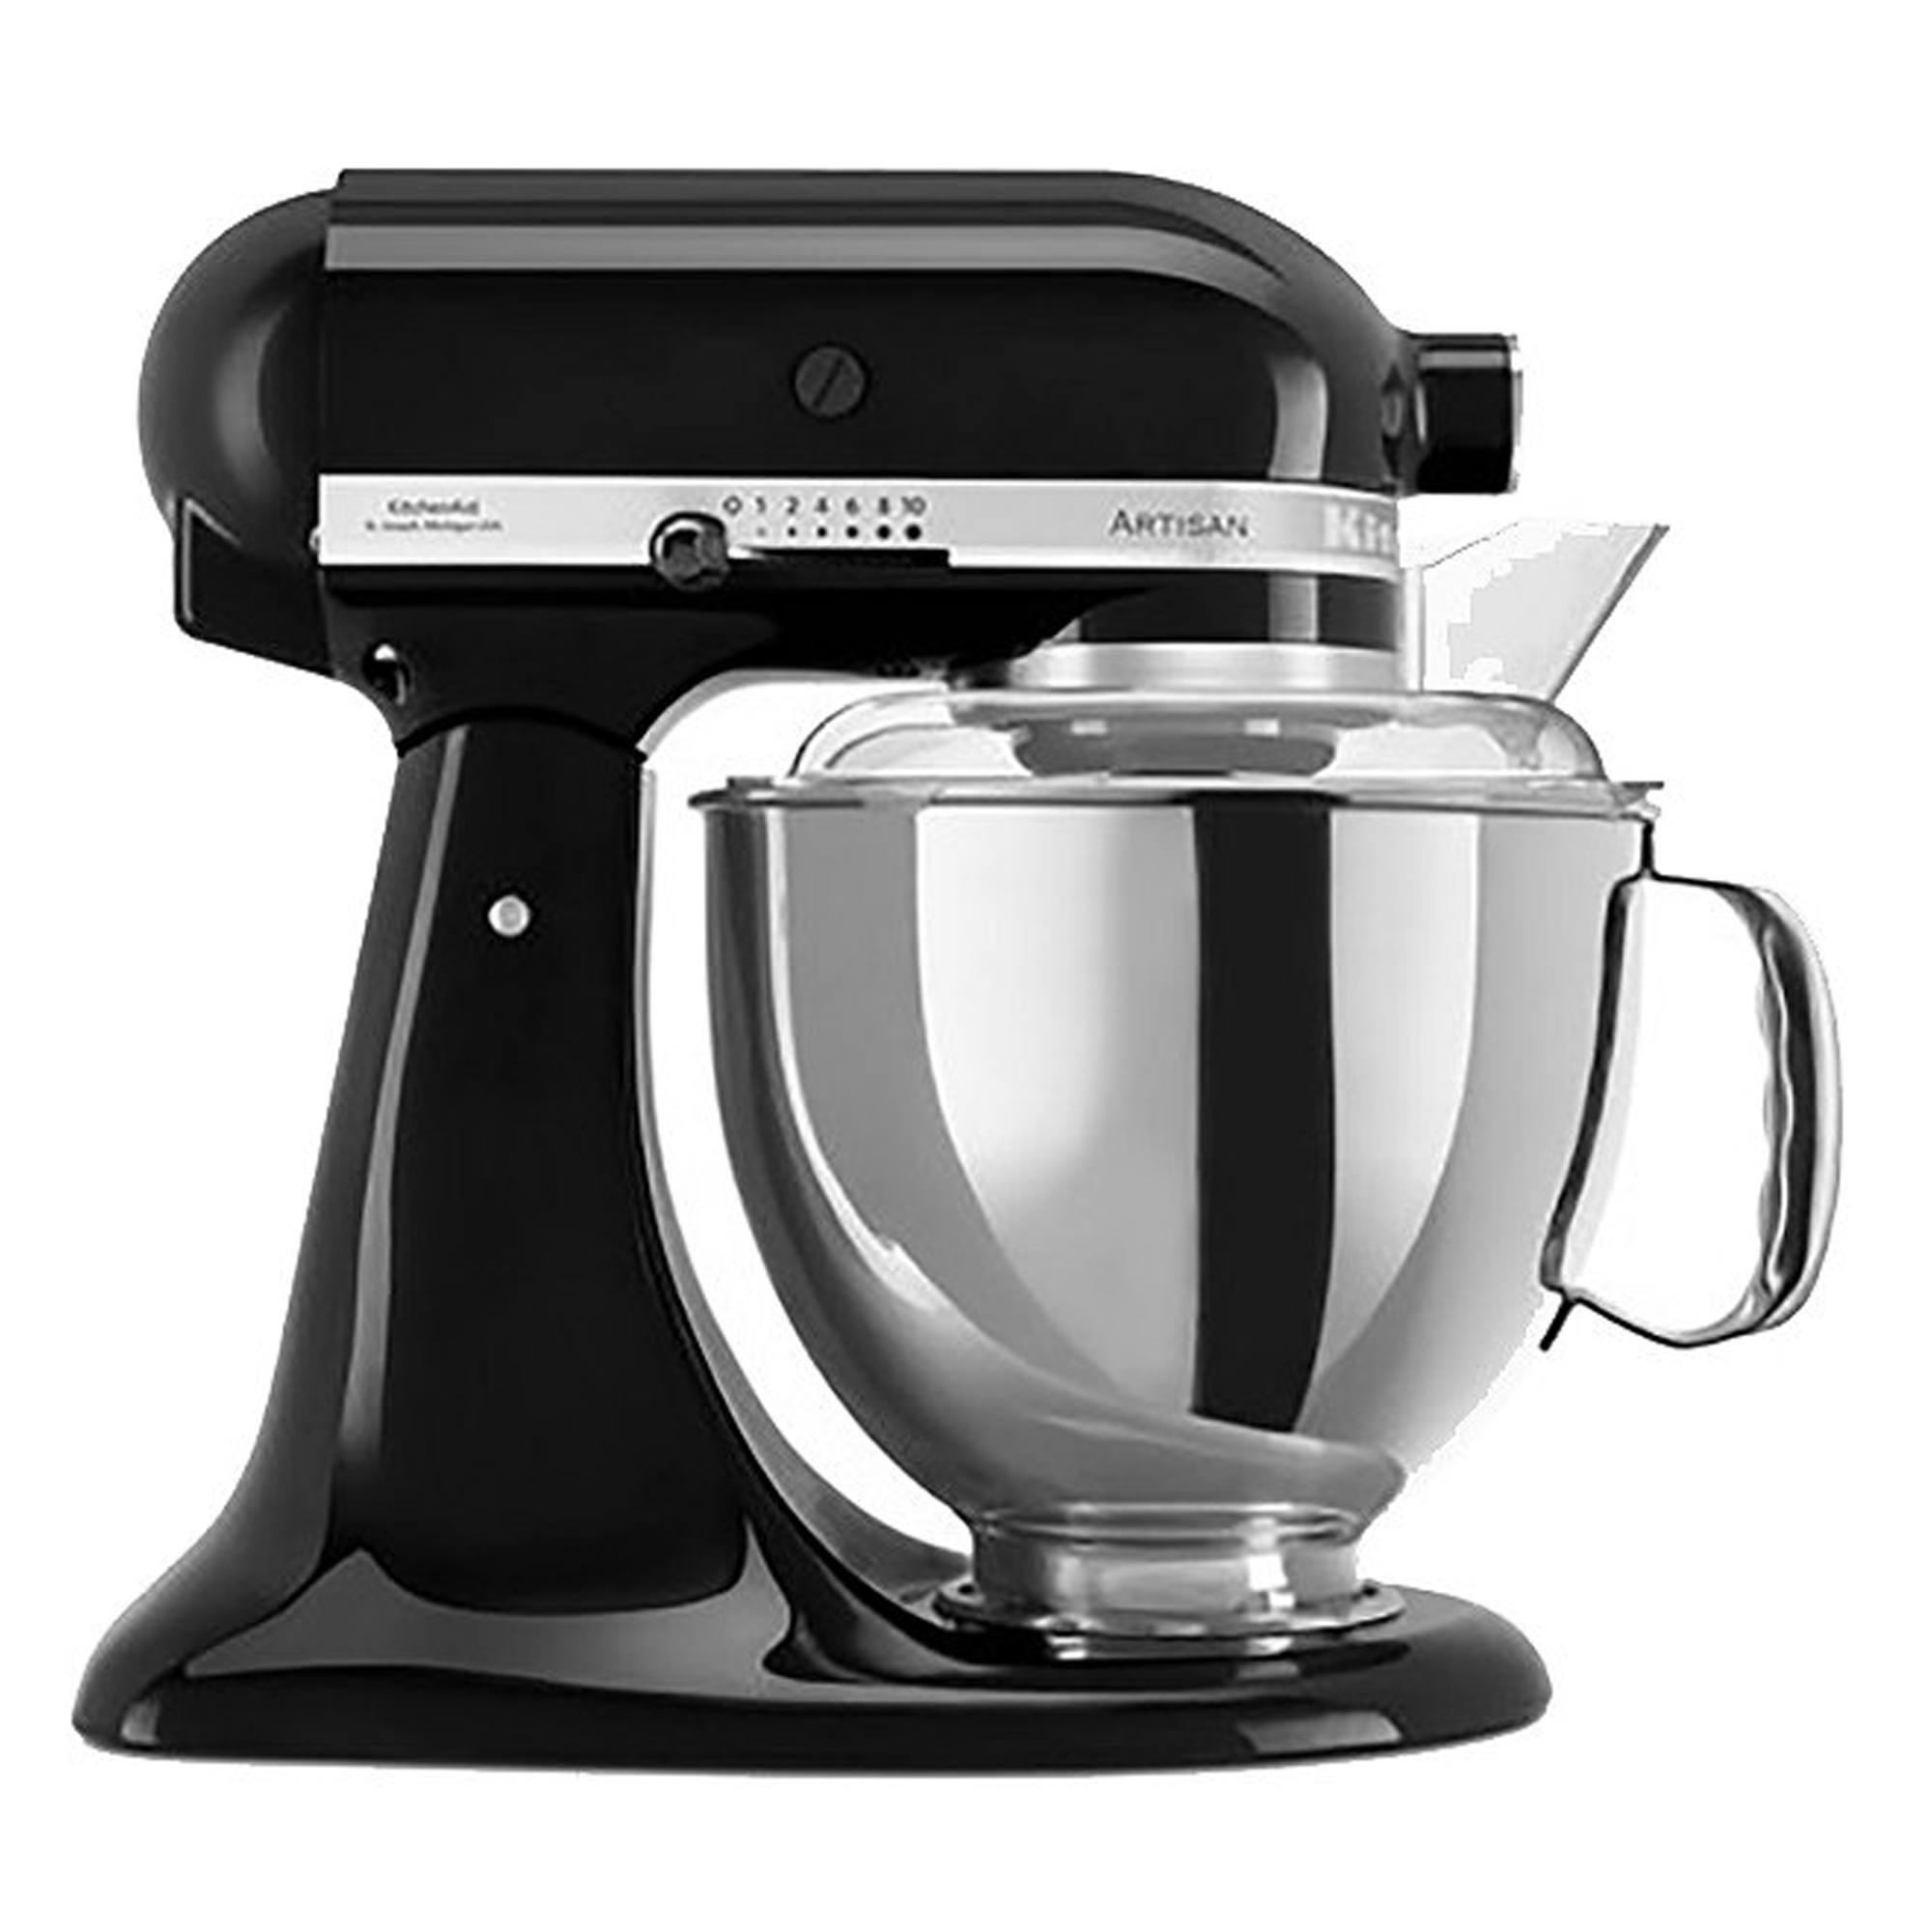 KitchenAid Artisan KSM150BBZ Stand Mixer Black Click+Collect £246.60 @ Hughes w/ voucher